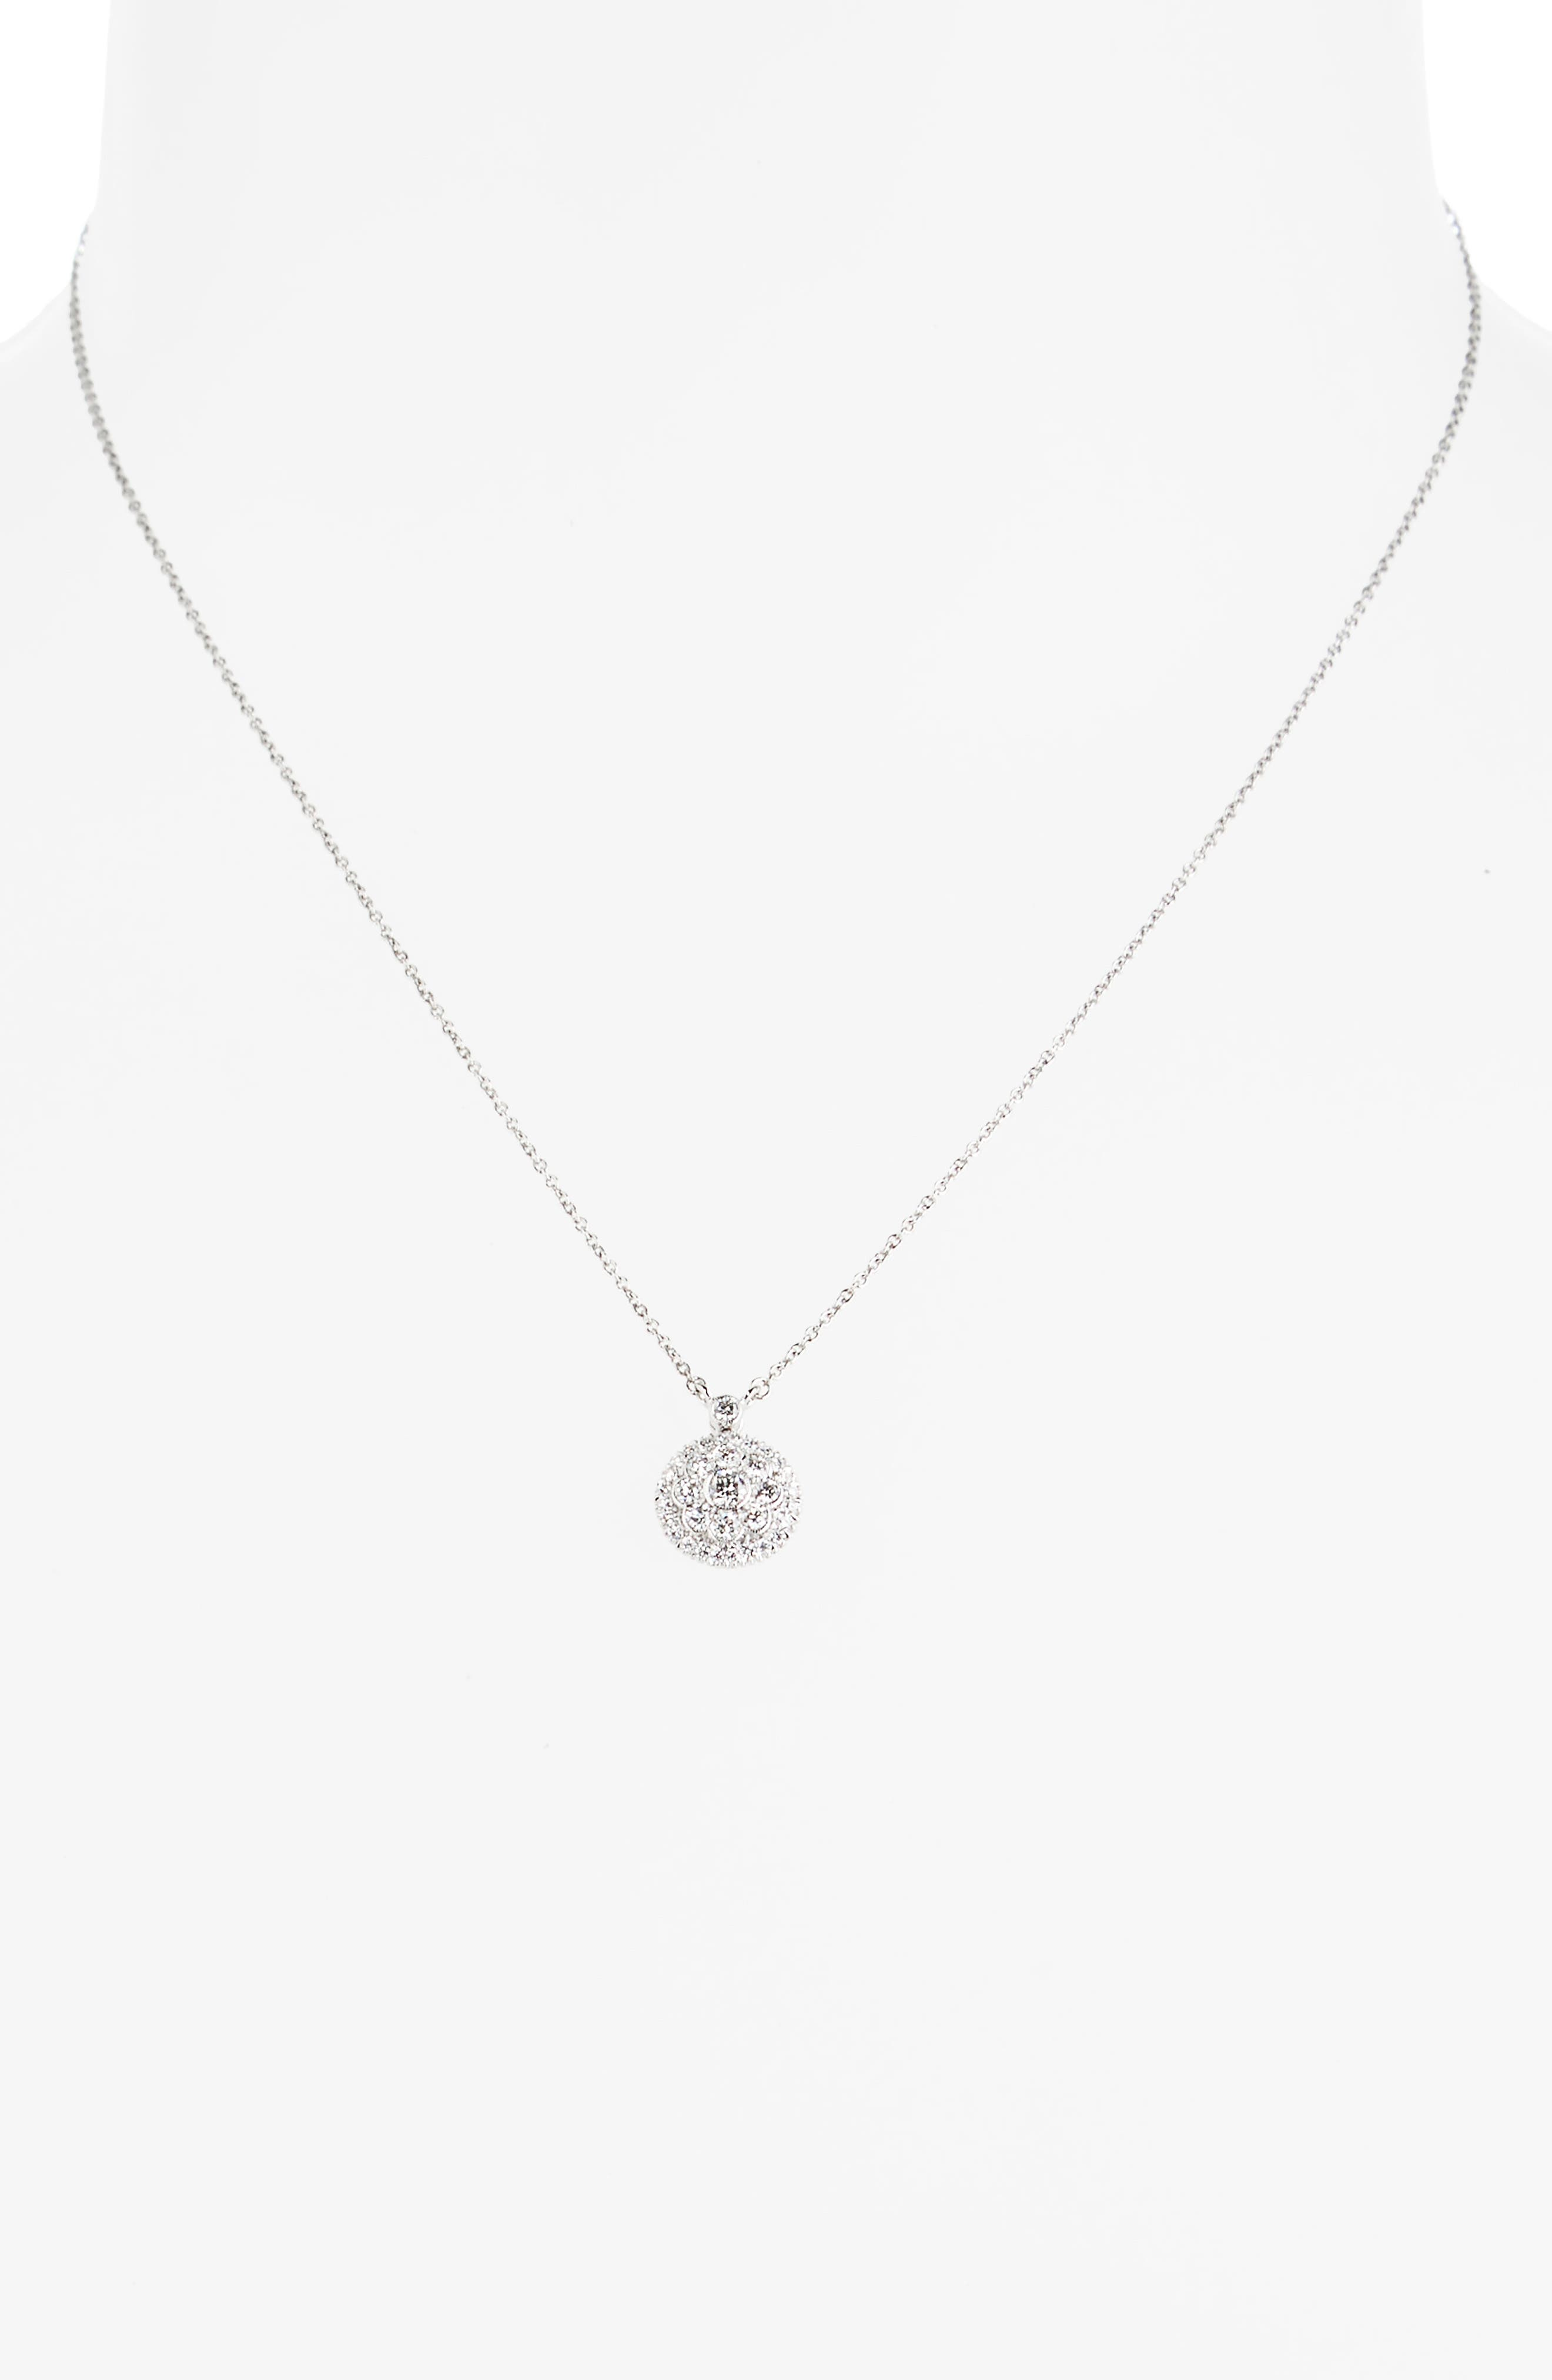 Diamond Pendant Necklace,                             Alternate thumbnail 2, color,                             WHITE GOLD